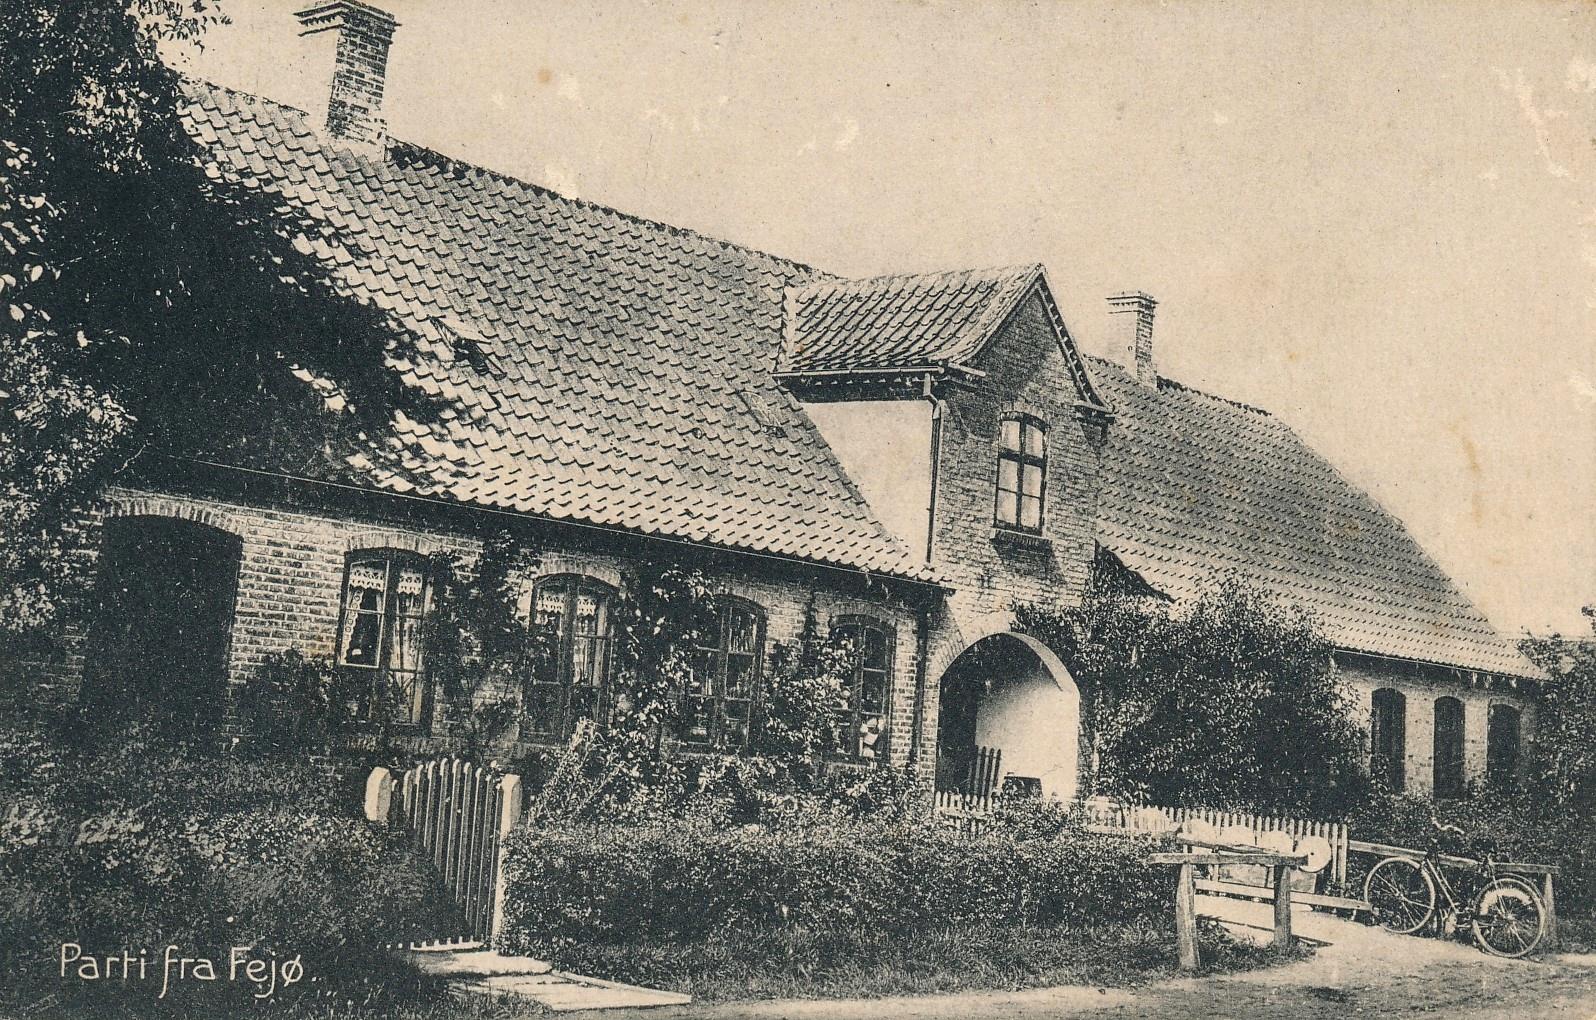 Siøs købmandsforretning, Herredsvej 259, Østerby, Fejø, postkort, cirka 1910